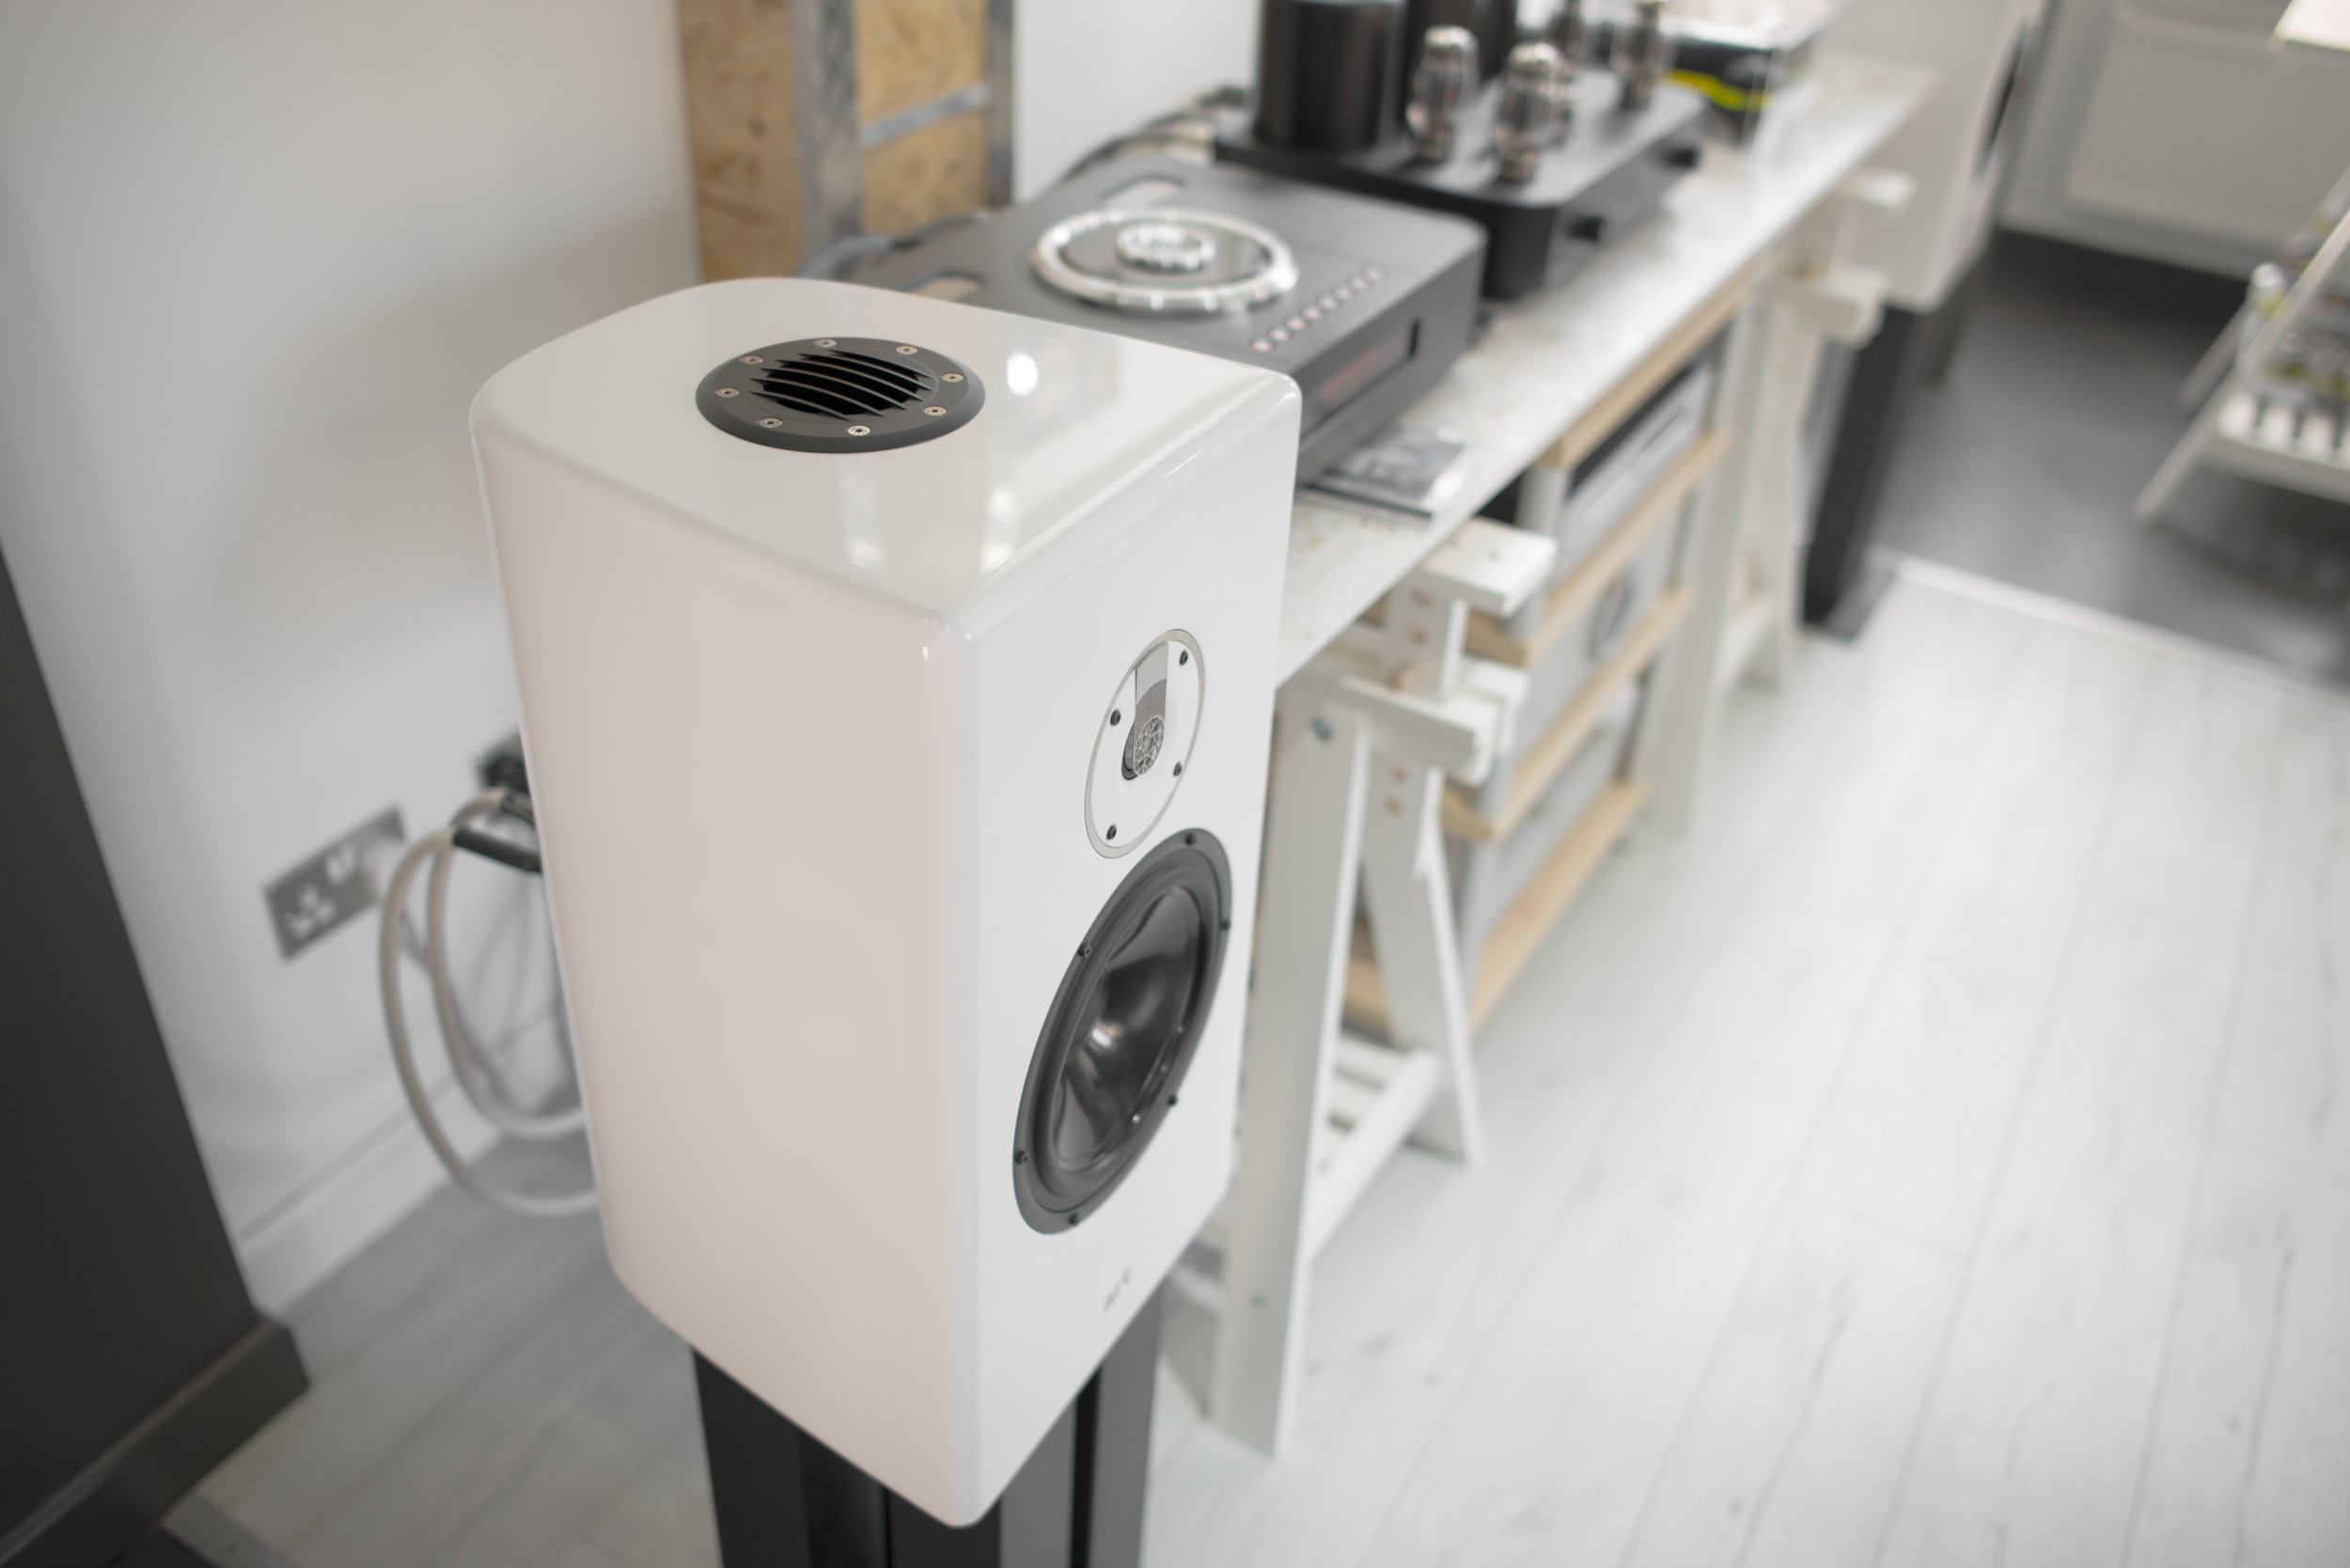 ART Loudspeakers DRAM Monitor 'Diamond version' speakers